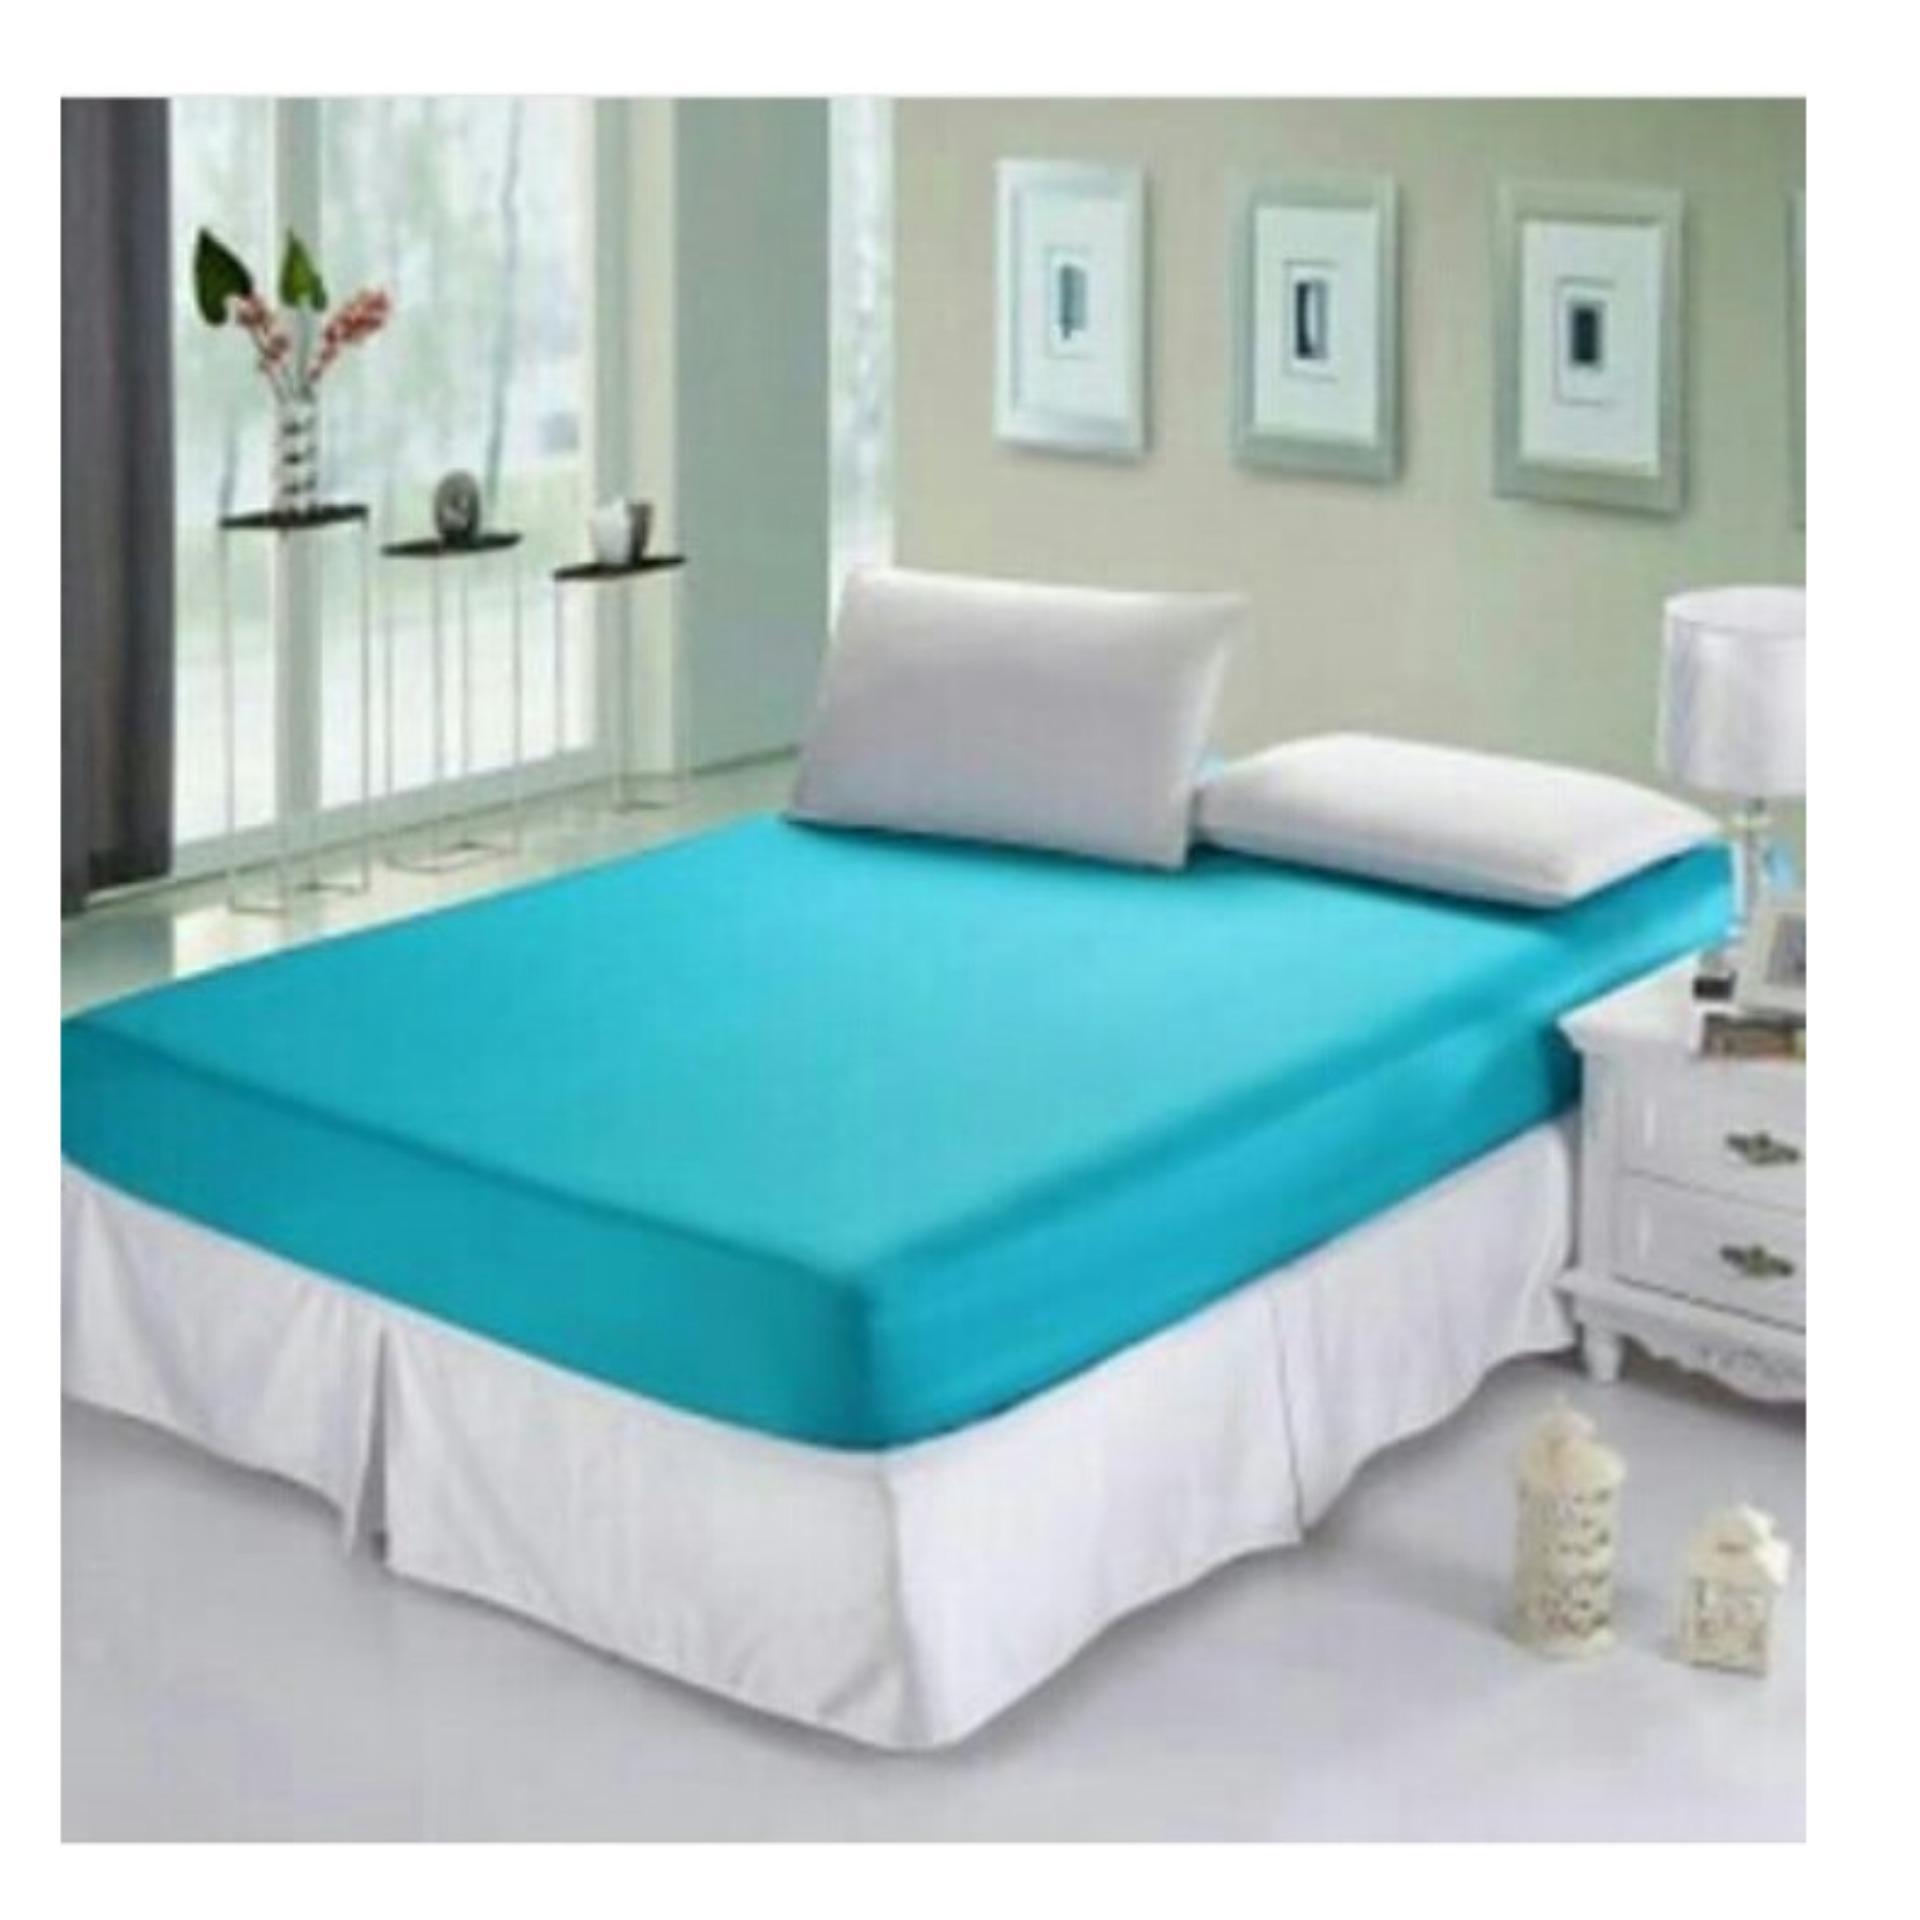 Harga Jaxine Sprei Waterproof Biru Muda 160 Jaxine Online